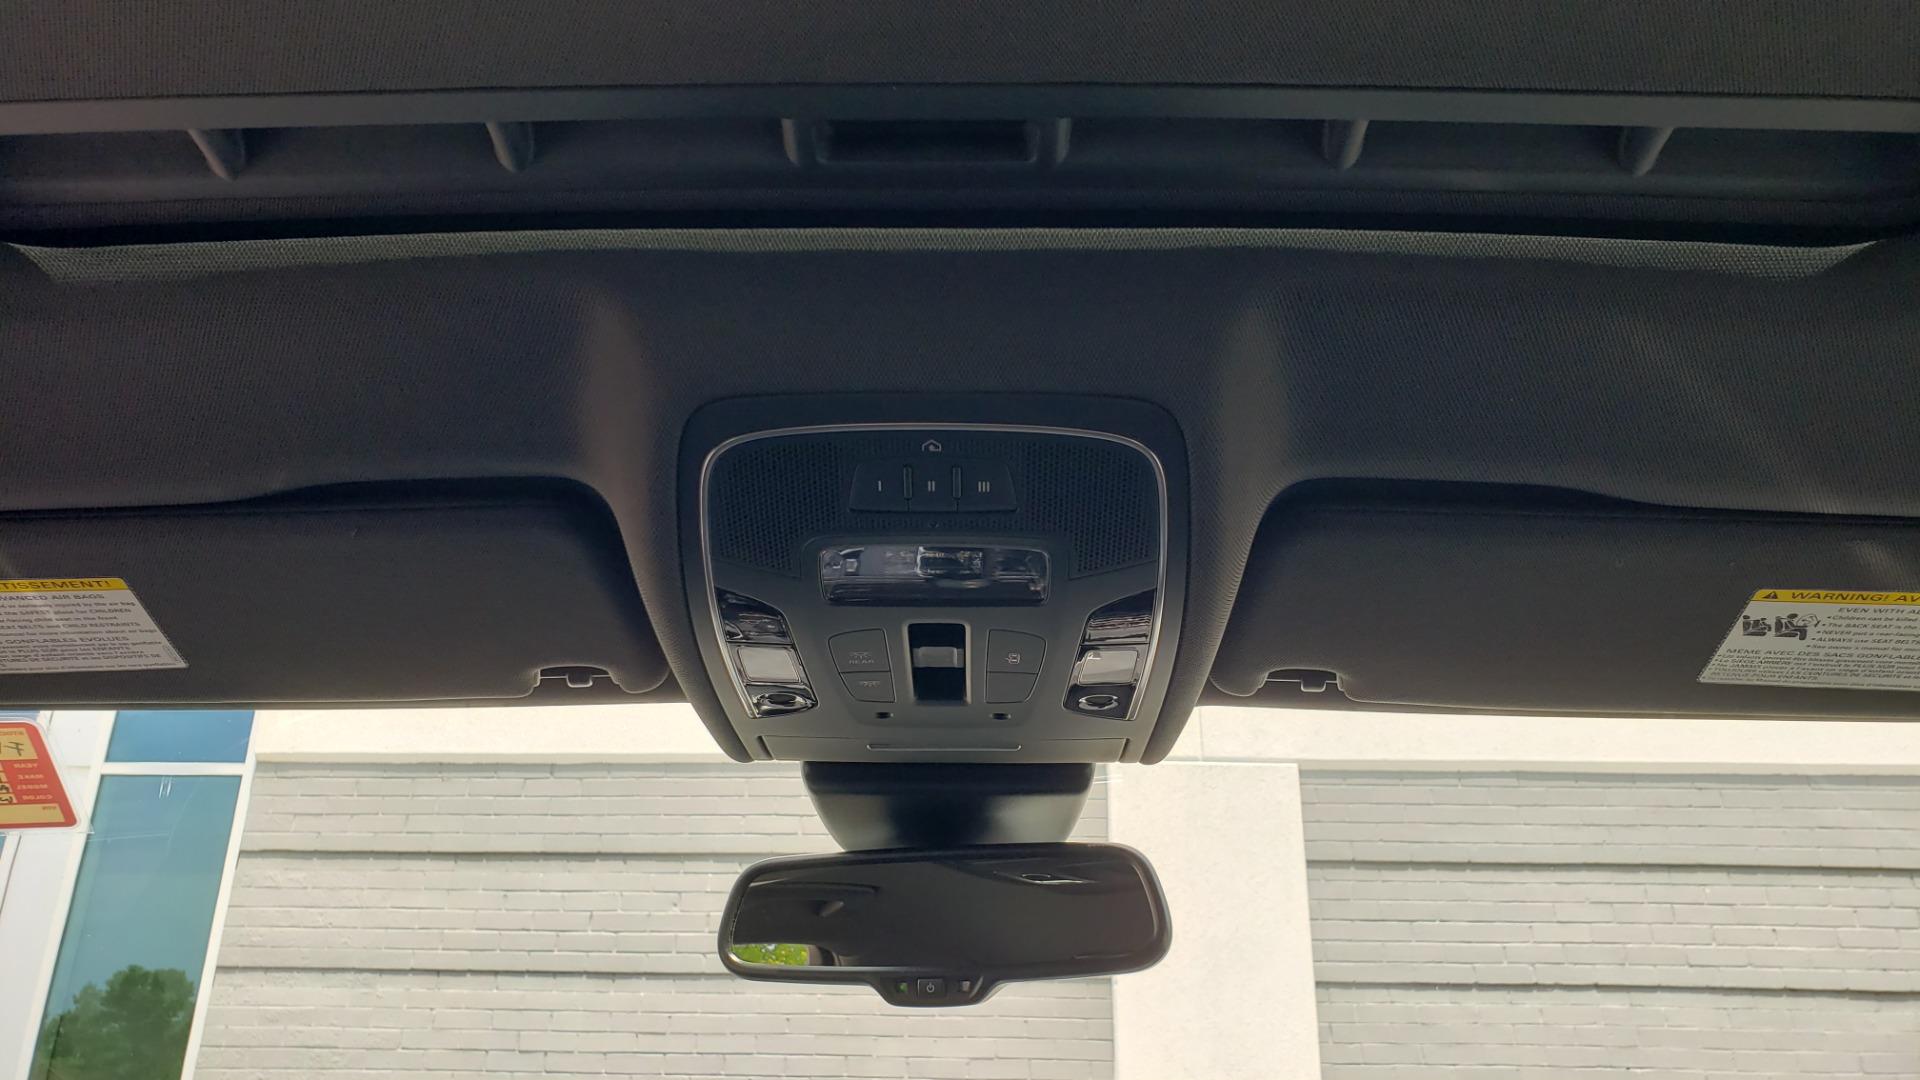 Used 2017 Audi A6 PRESTIGE SEDAN 3.0T / NAV / SUNROOF / BLACK OPTIC / CLD WTHR / REARVIEW for sale $30,797 at Formula Imports in Charlotte NC 28227 81